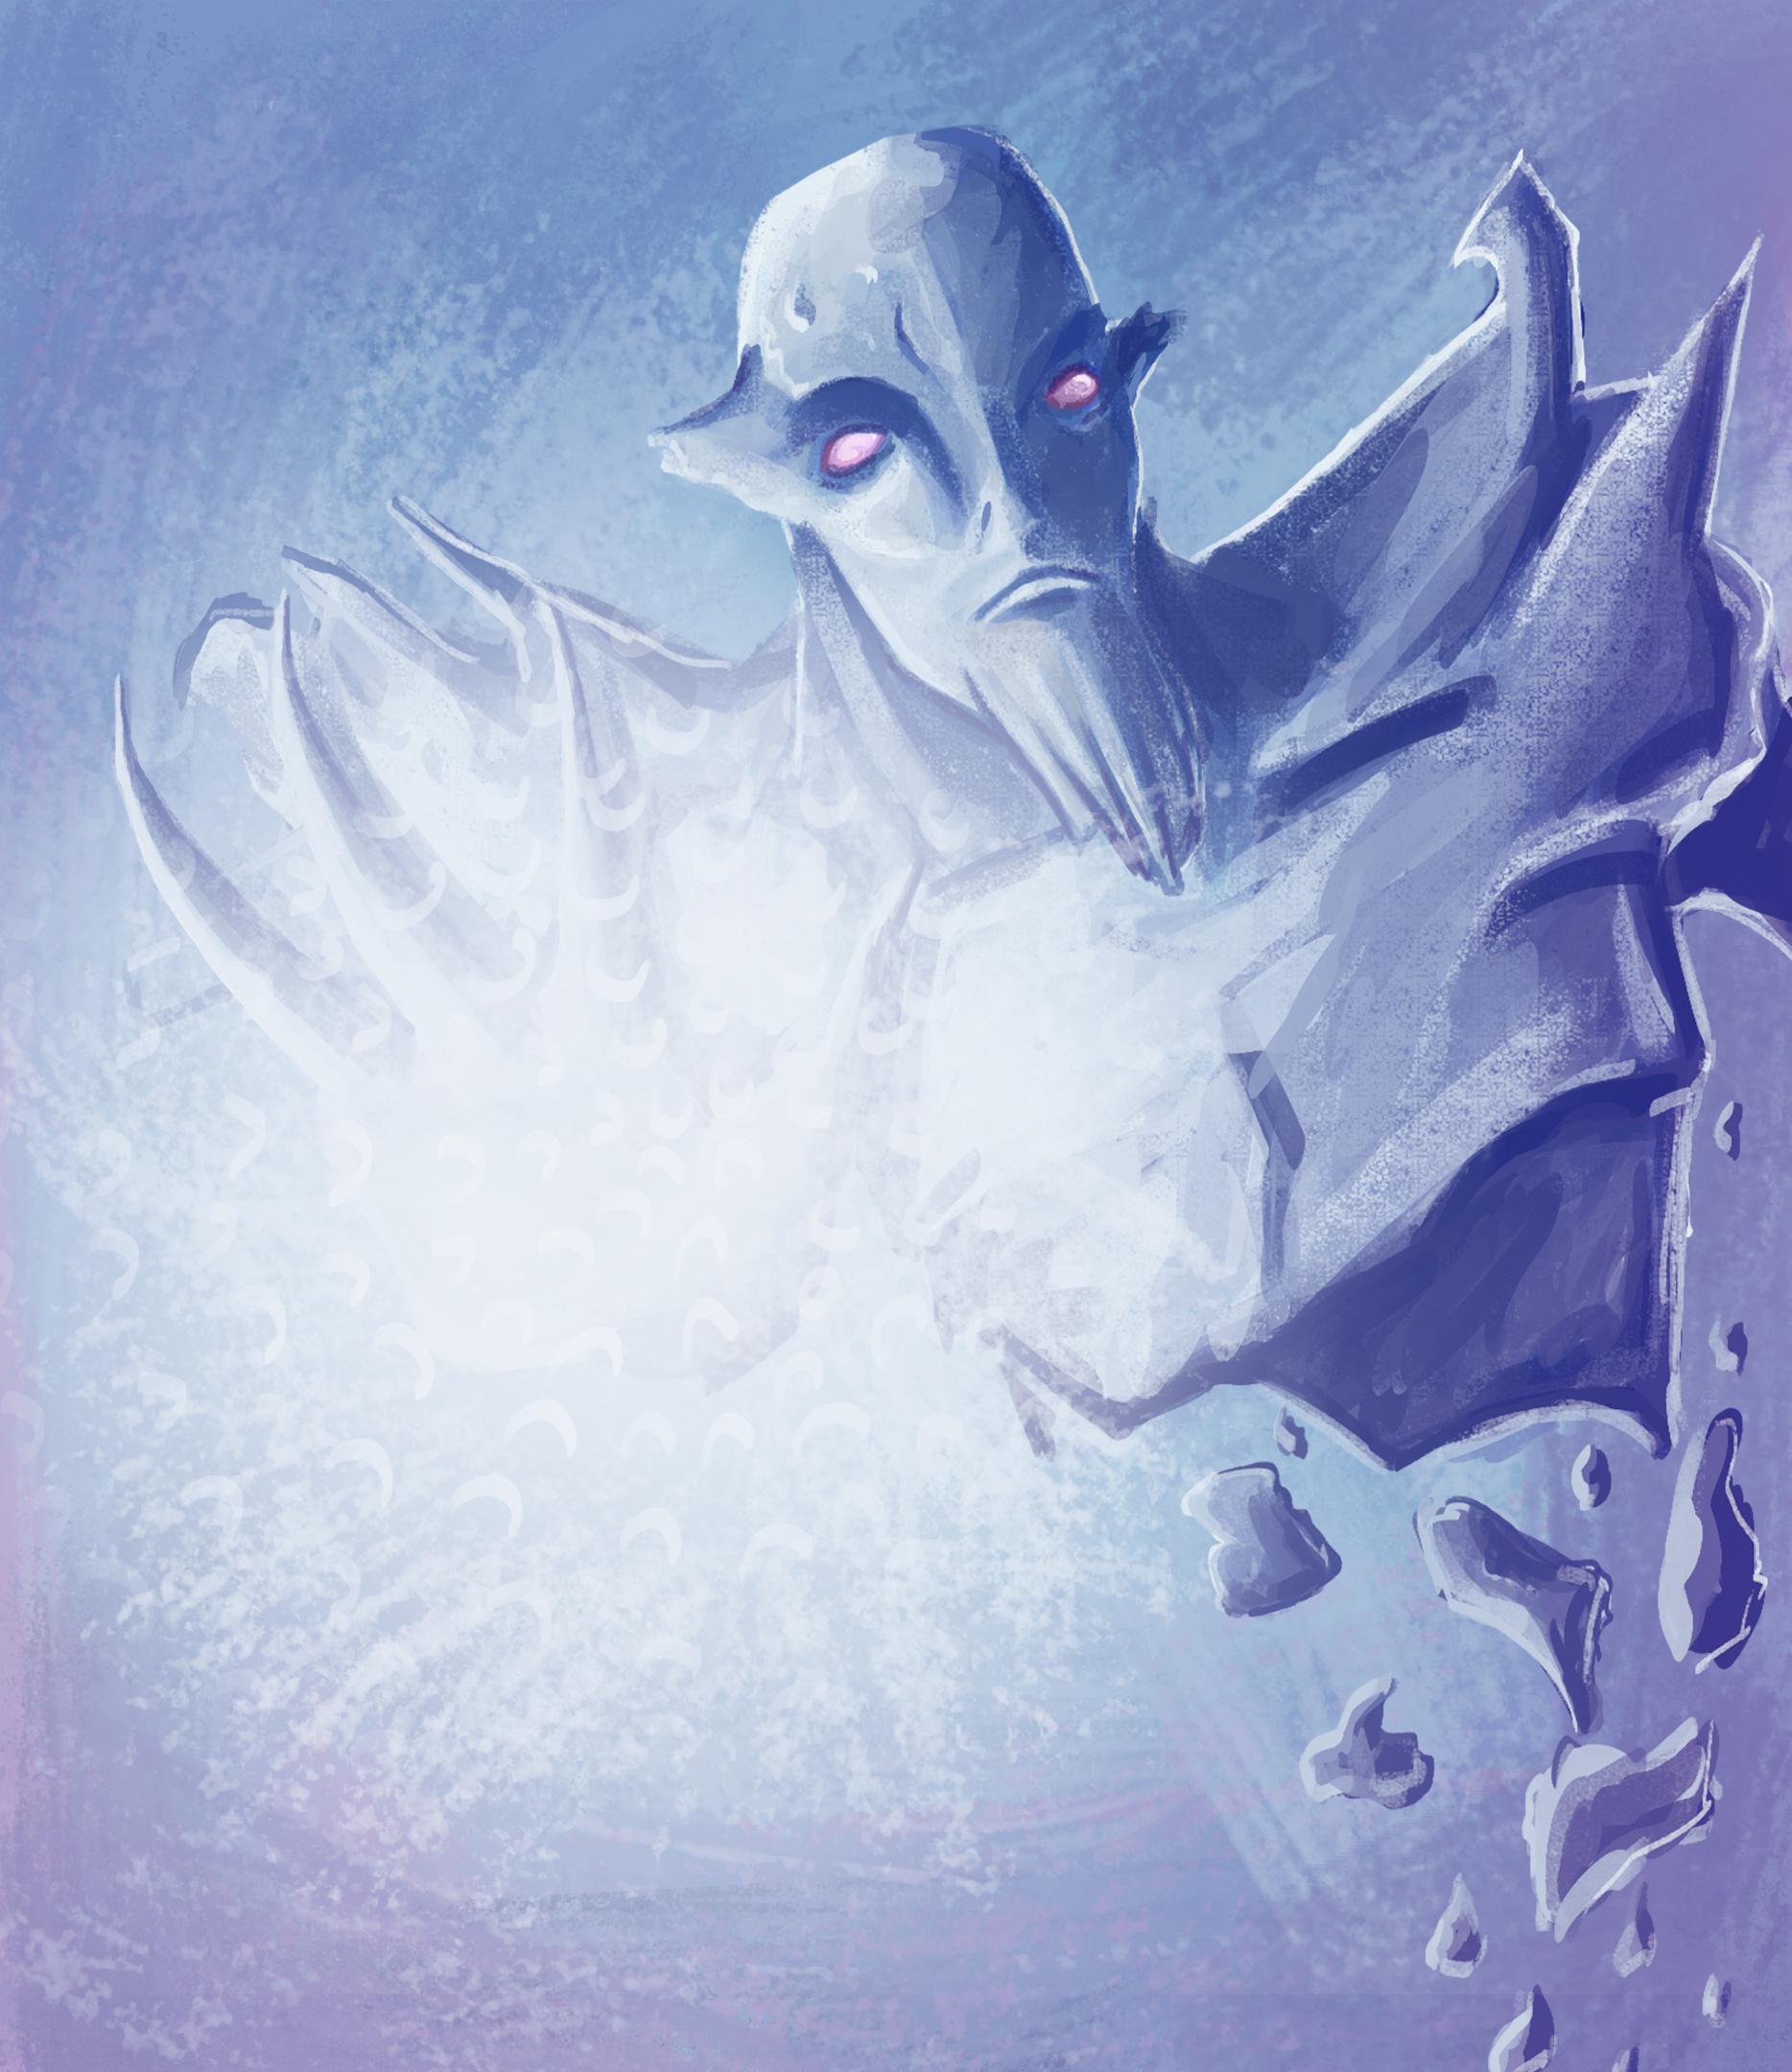 Dota 2: Ancient Apparition